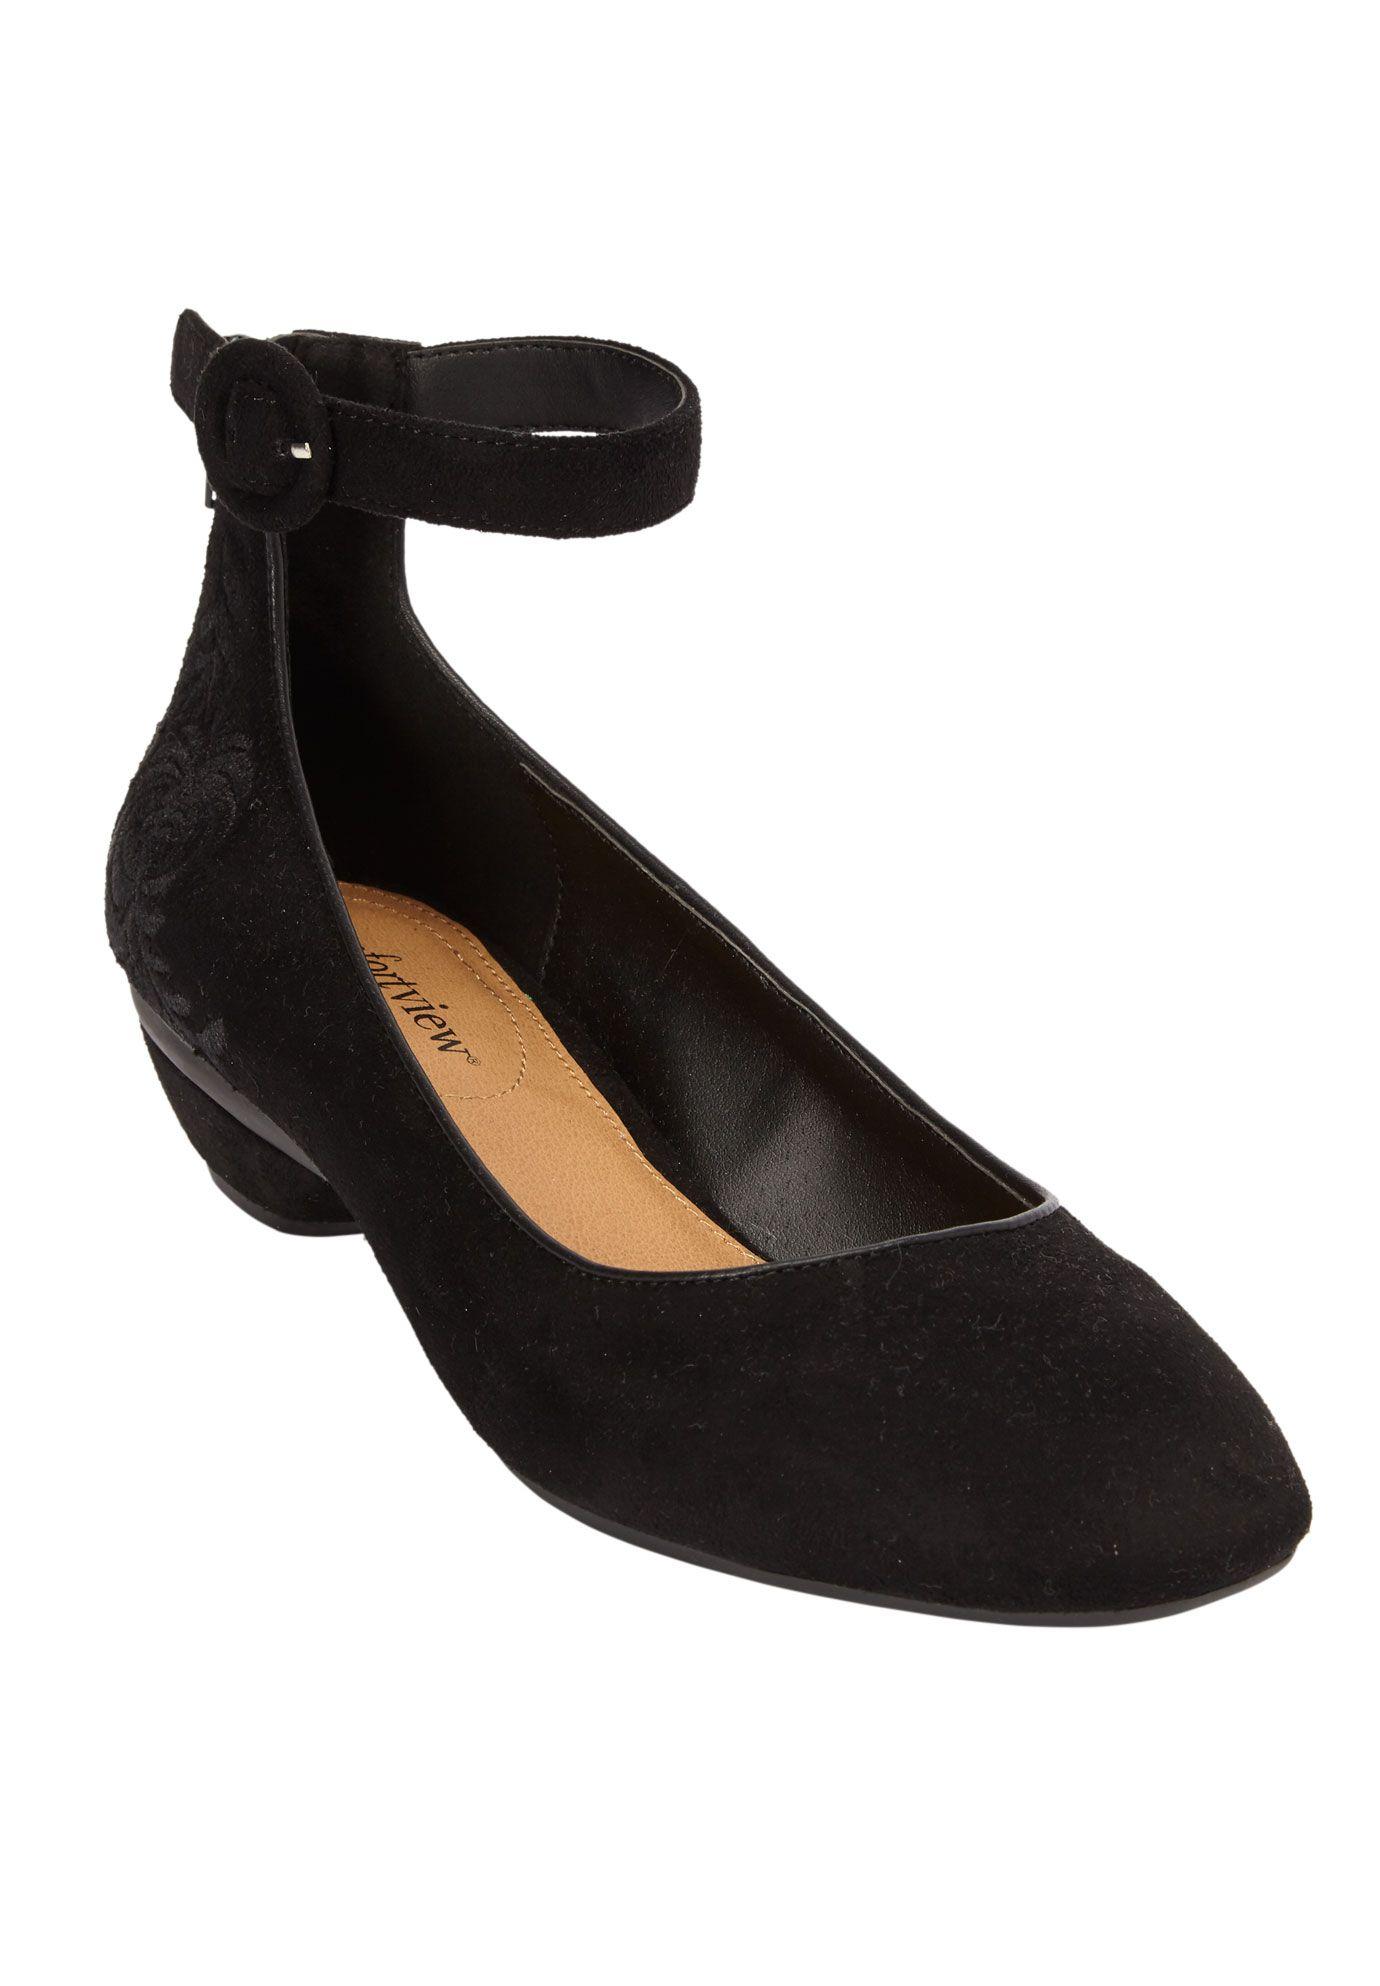 Comfortview Comfortview Women S Wide Width The Pixie Pump Heeled Shoes Walmart Com In 2021 Dress Shoes Womens Pumps Heels Plus Size Black Dresses [ 1986 x 1380 Pixel ]